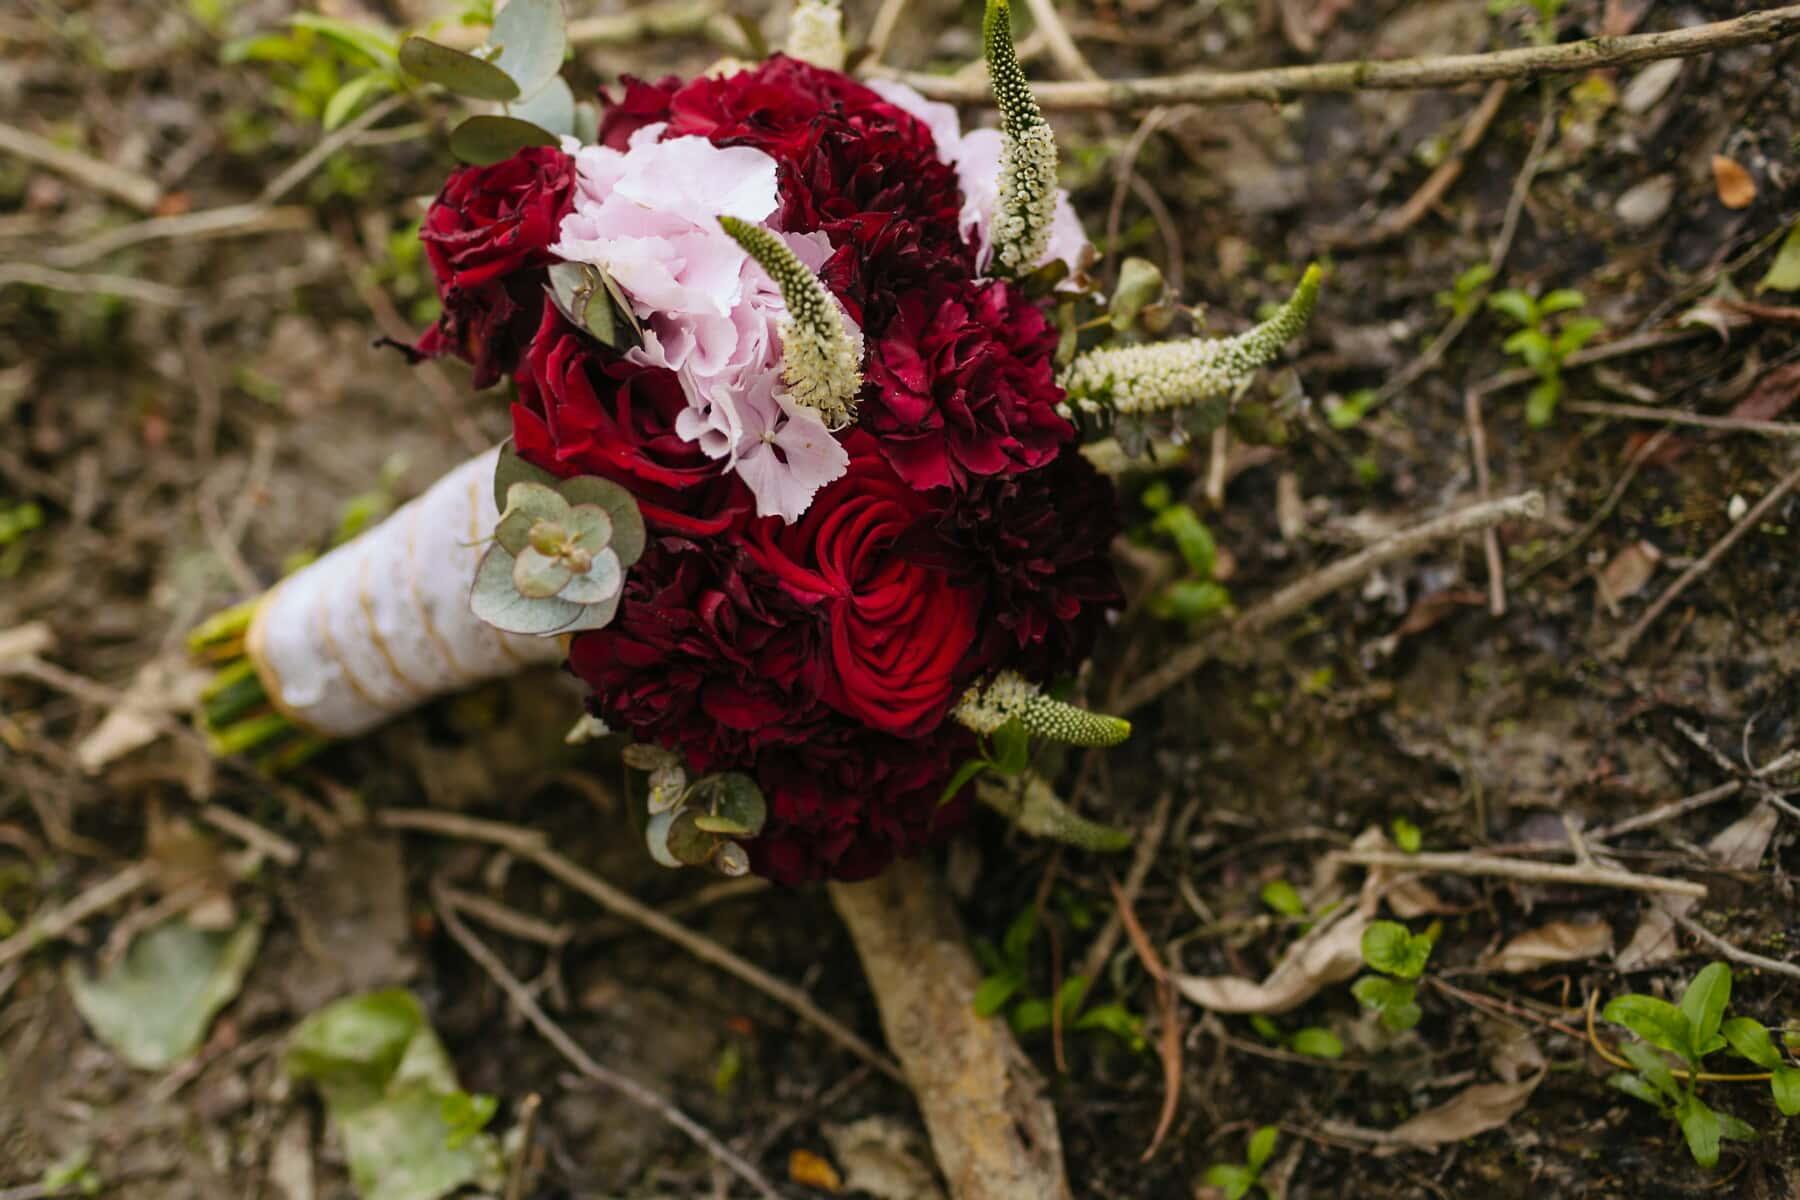 bouquet, wedding bouquet, dark red, roses, flower, herb, plant, leaf, rose, flora